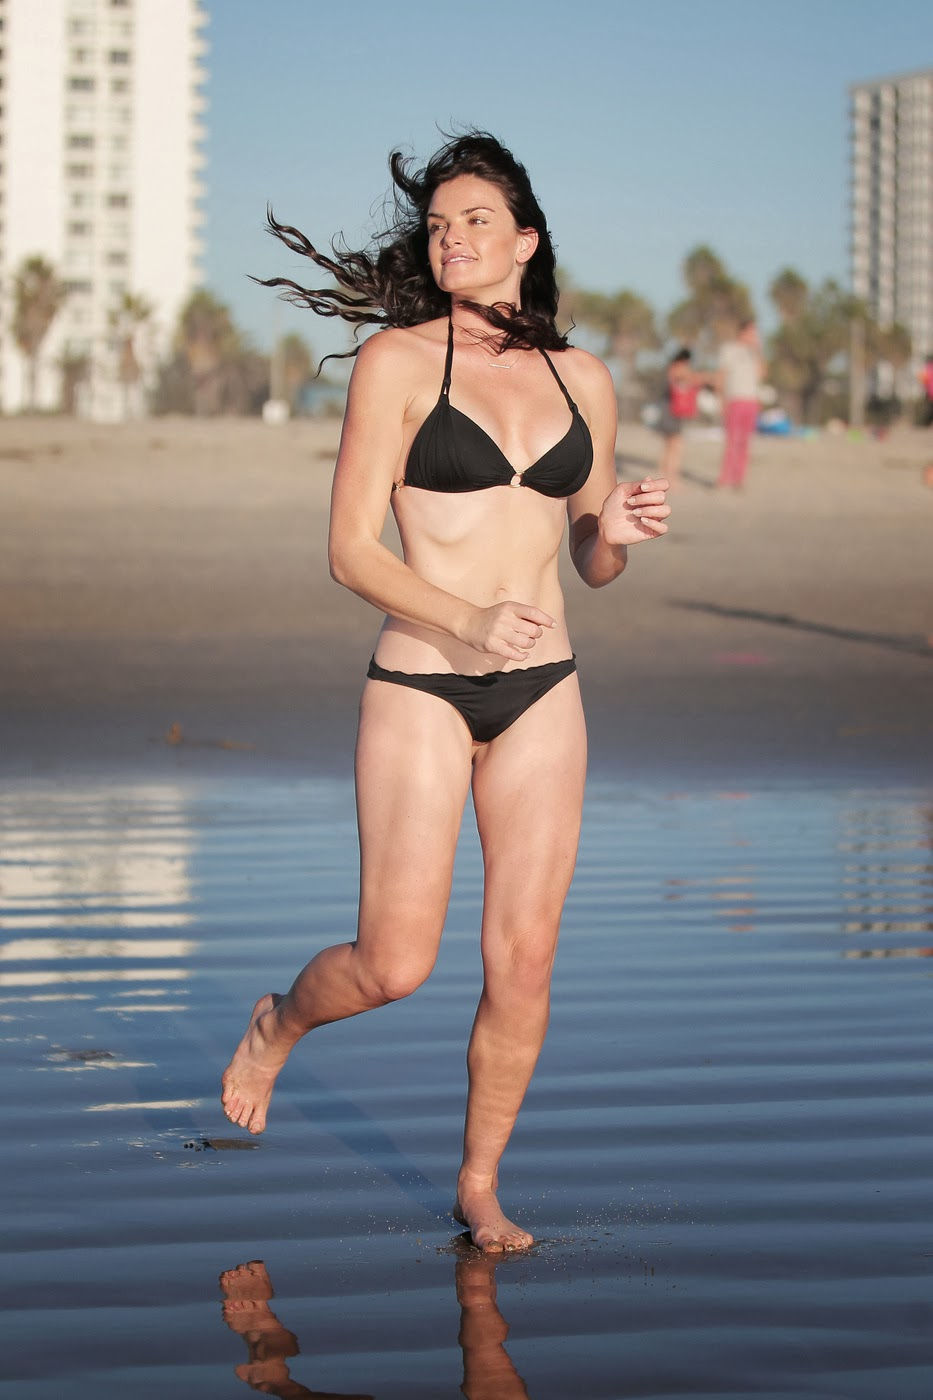 Paparazzi Megan Trinidad nudes (66 photo), Sexy, Paparazzi, Feet, swimsuit 2006